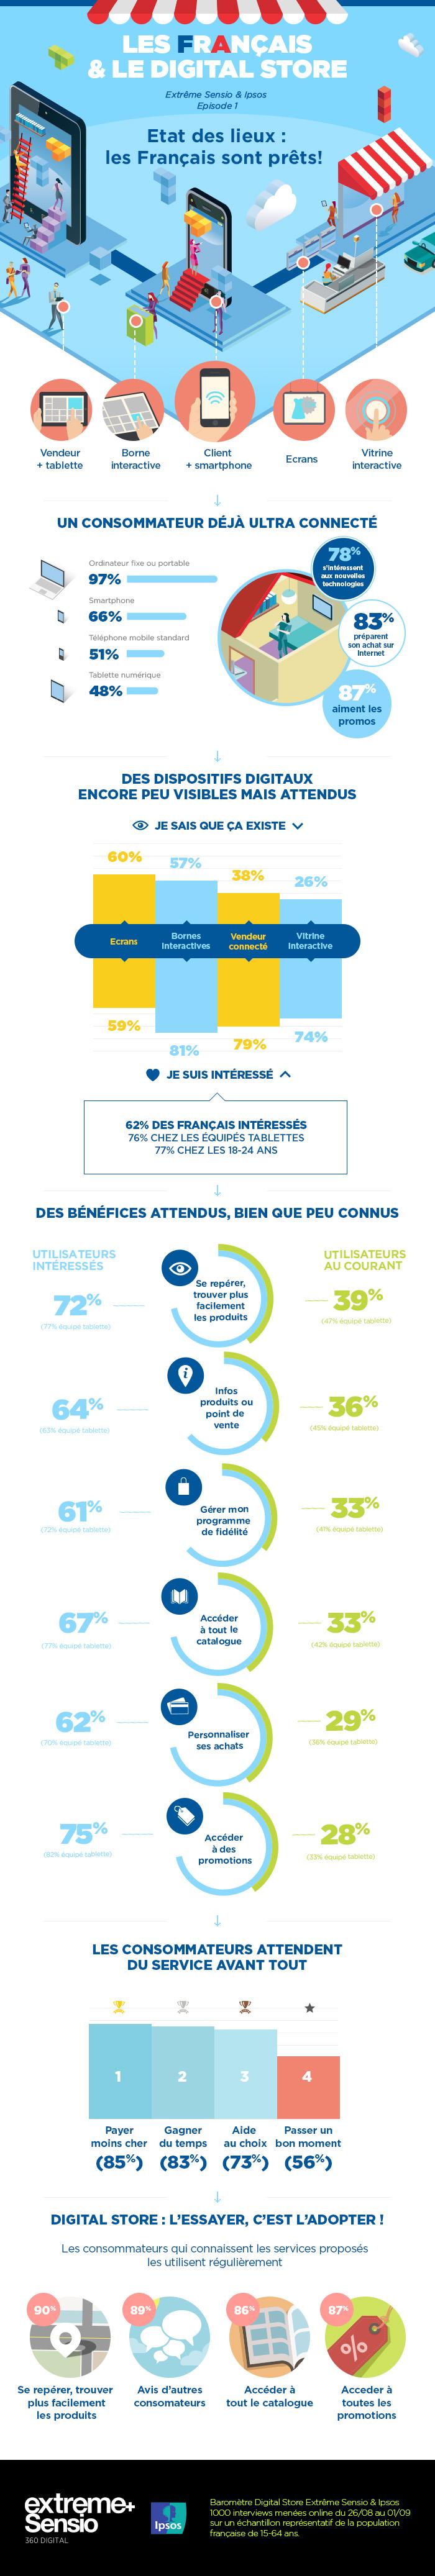 infographie-digital-store-marche-français-ipsos-extreme-sensio-2014